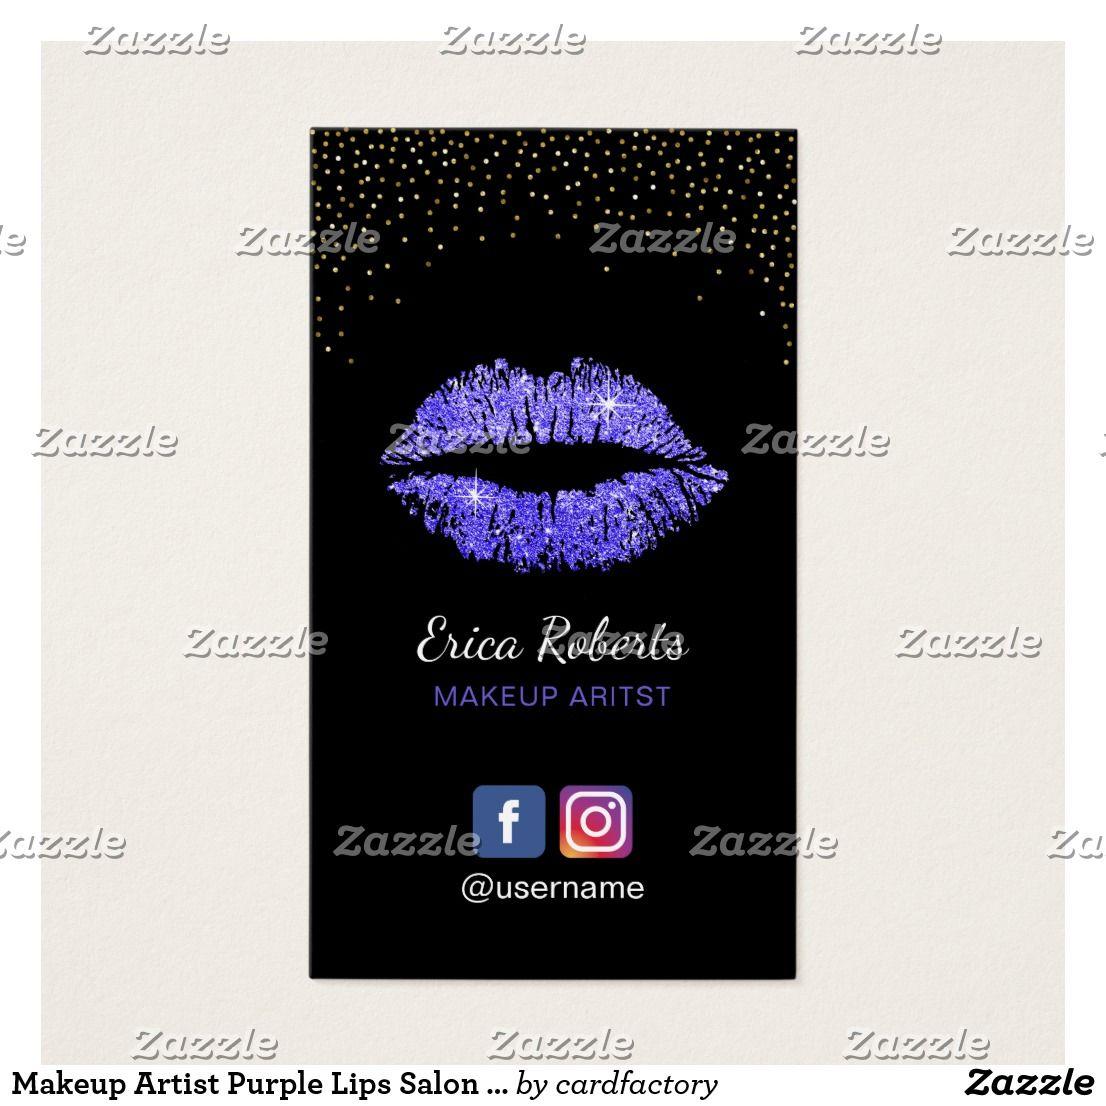 Makeup artist purple lips salon social media business card makeup artist purple lips salon social media business card magicingreecefo Images